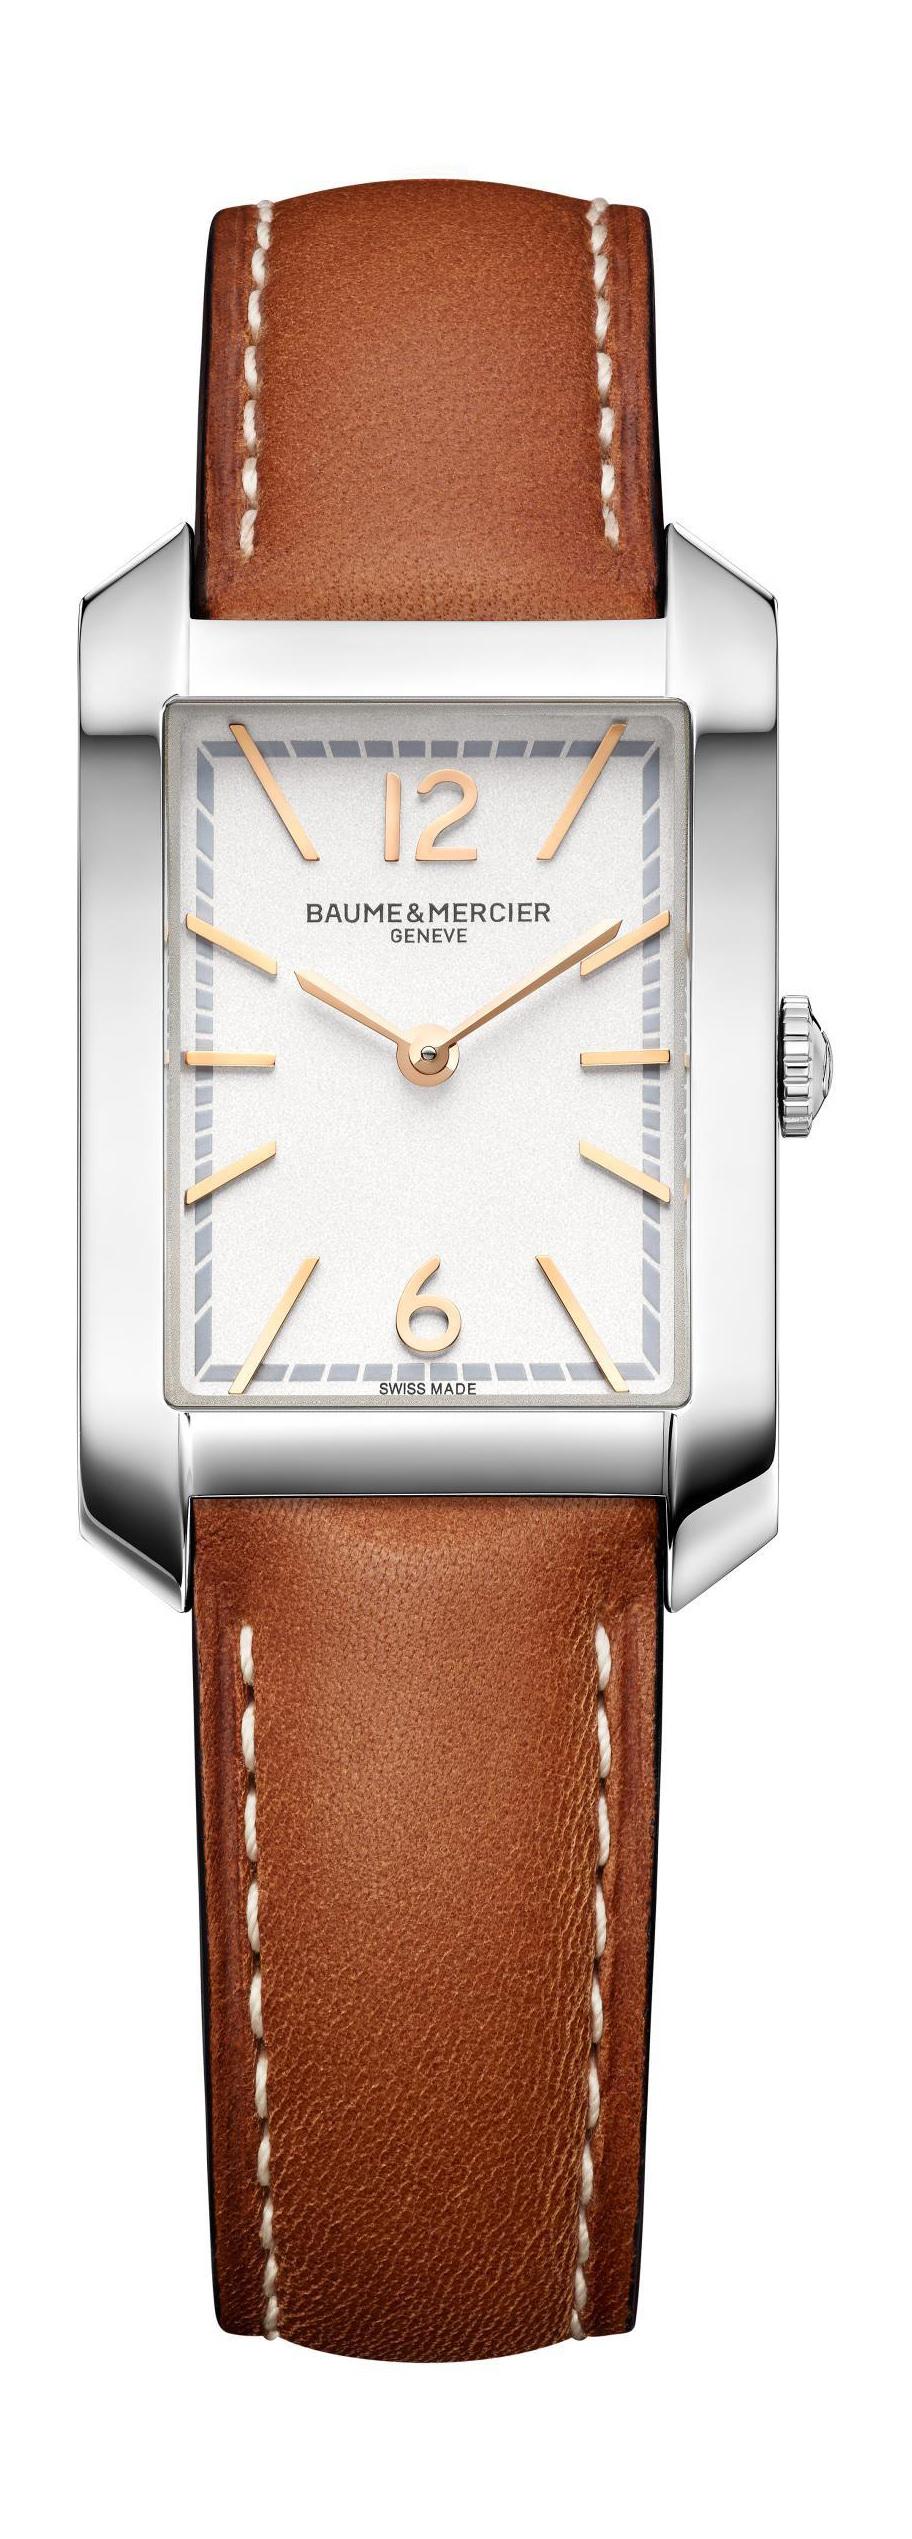 Baume Et Mercier Hampton Quartz Silver Dial Ladies Watch 10472 In Brown,gold Tone,pink,rose Gold Tone,silver Tone